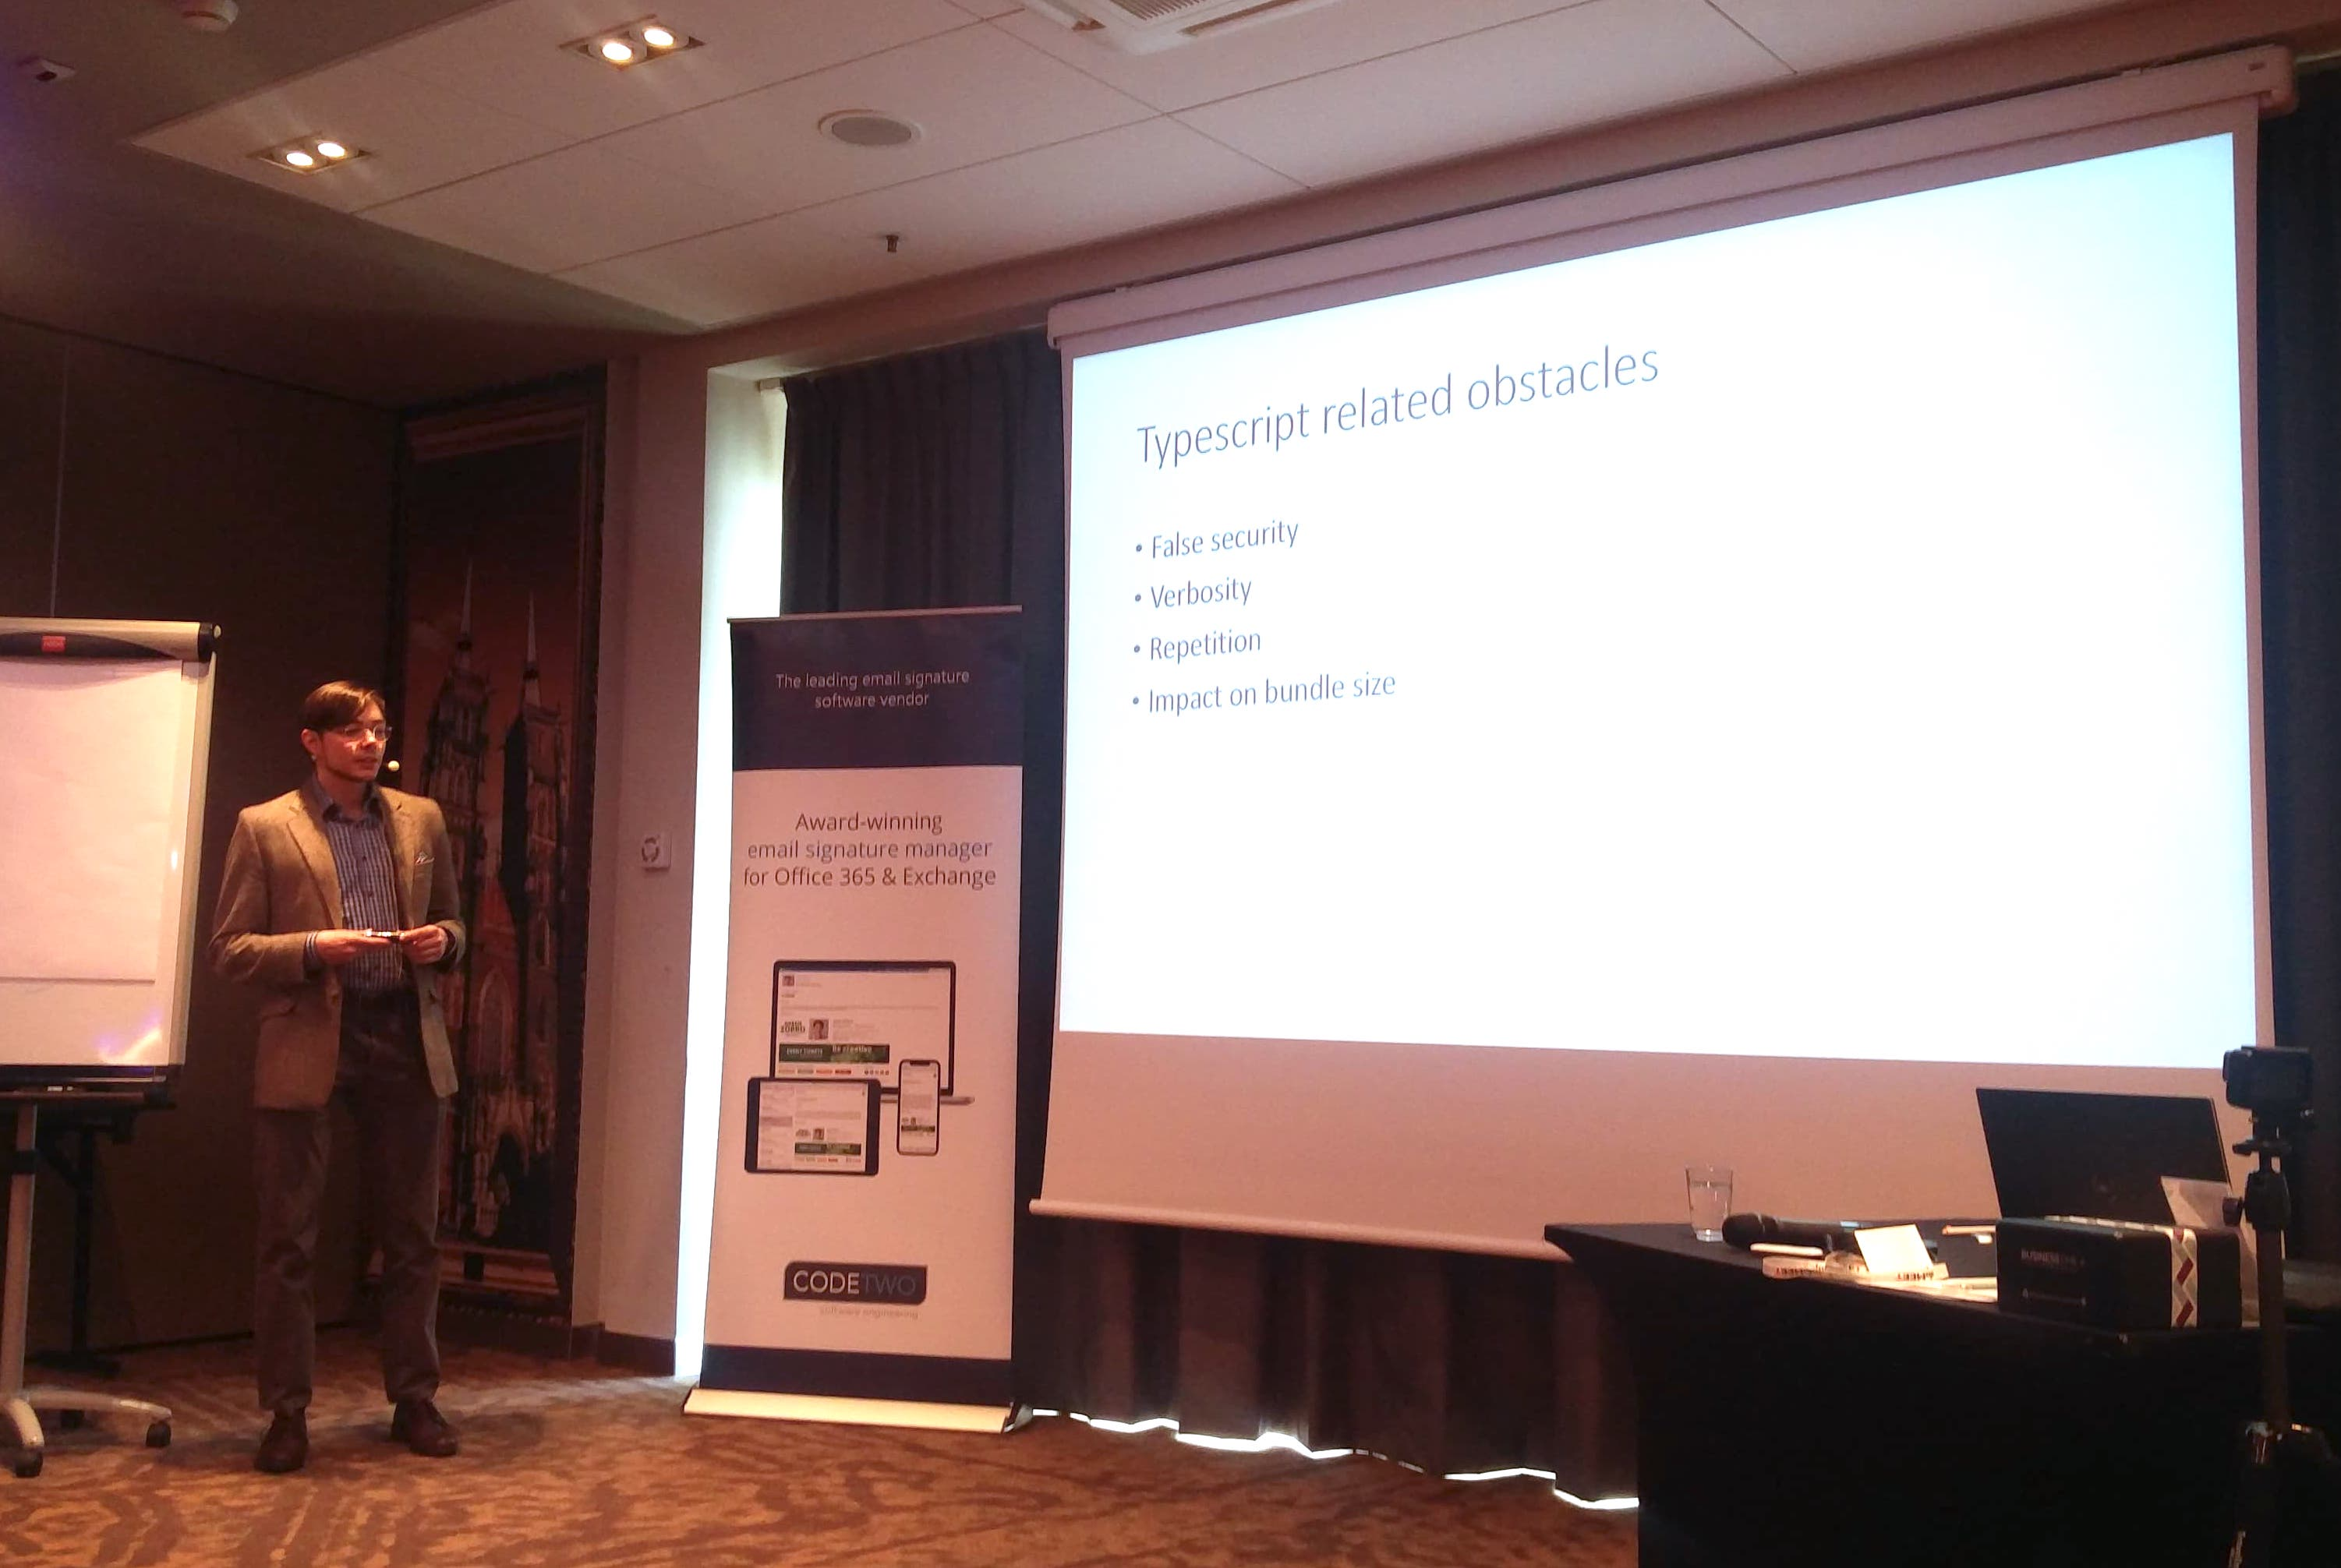 Jędrzej's lecture on Infomeet